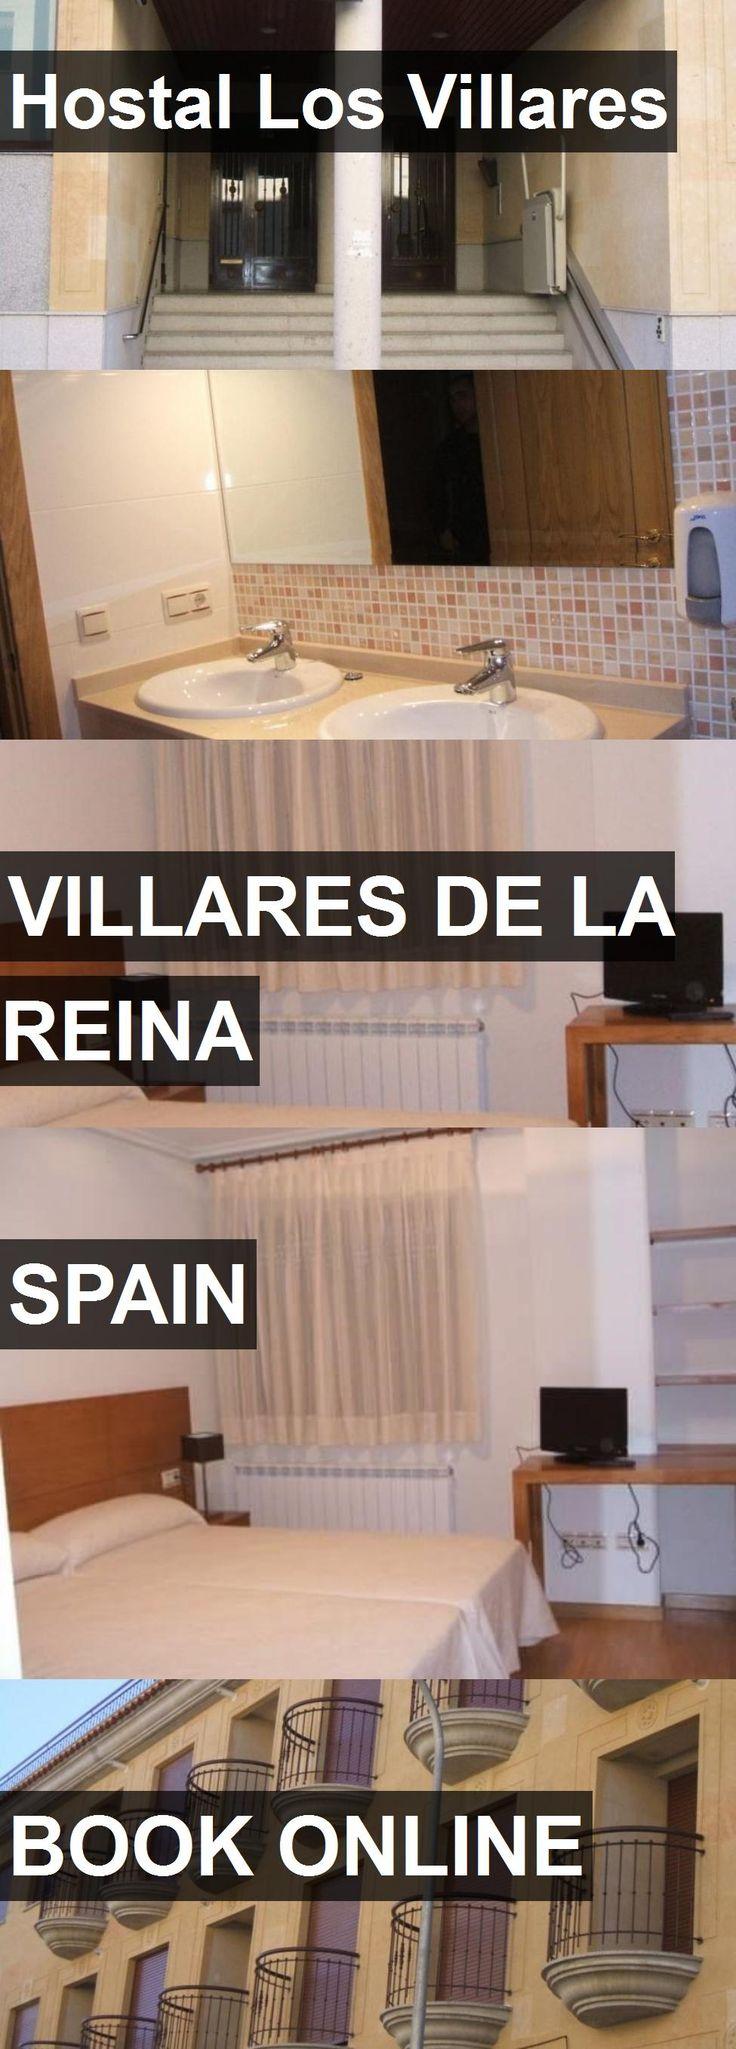 Hotel Hostal Los Villares in Villares de la Reina, Spain. For more information, photos, reviews and best prices please follow the link. #Spain #VillaresdelaReina #travel #vacation #hotel